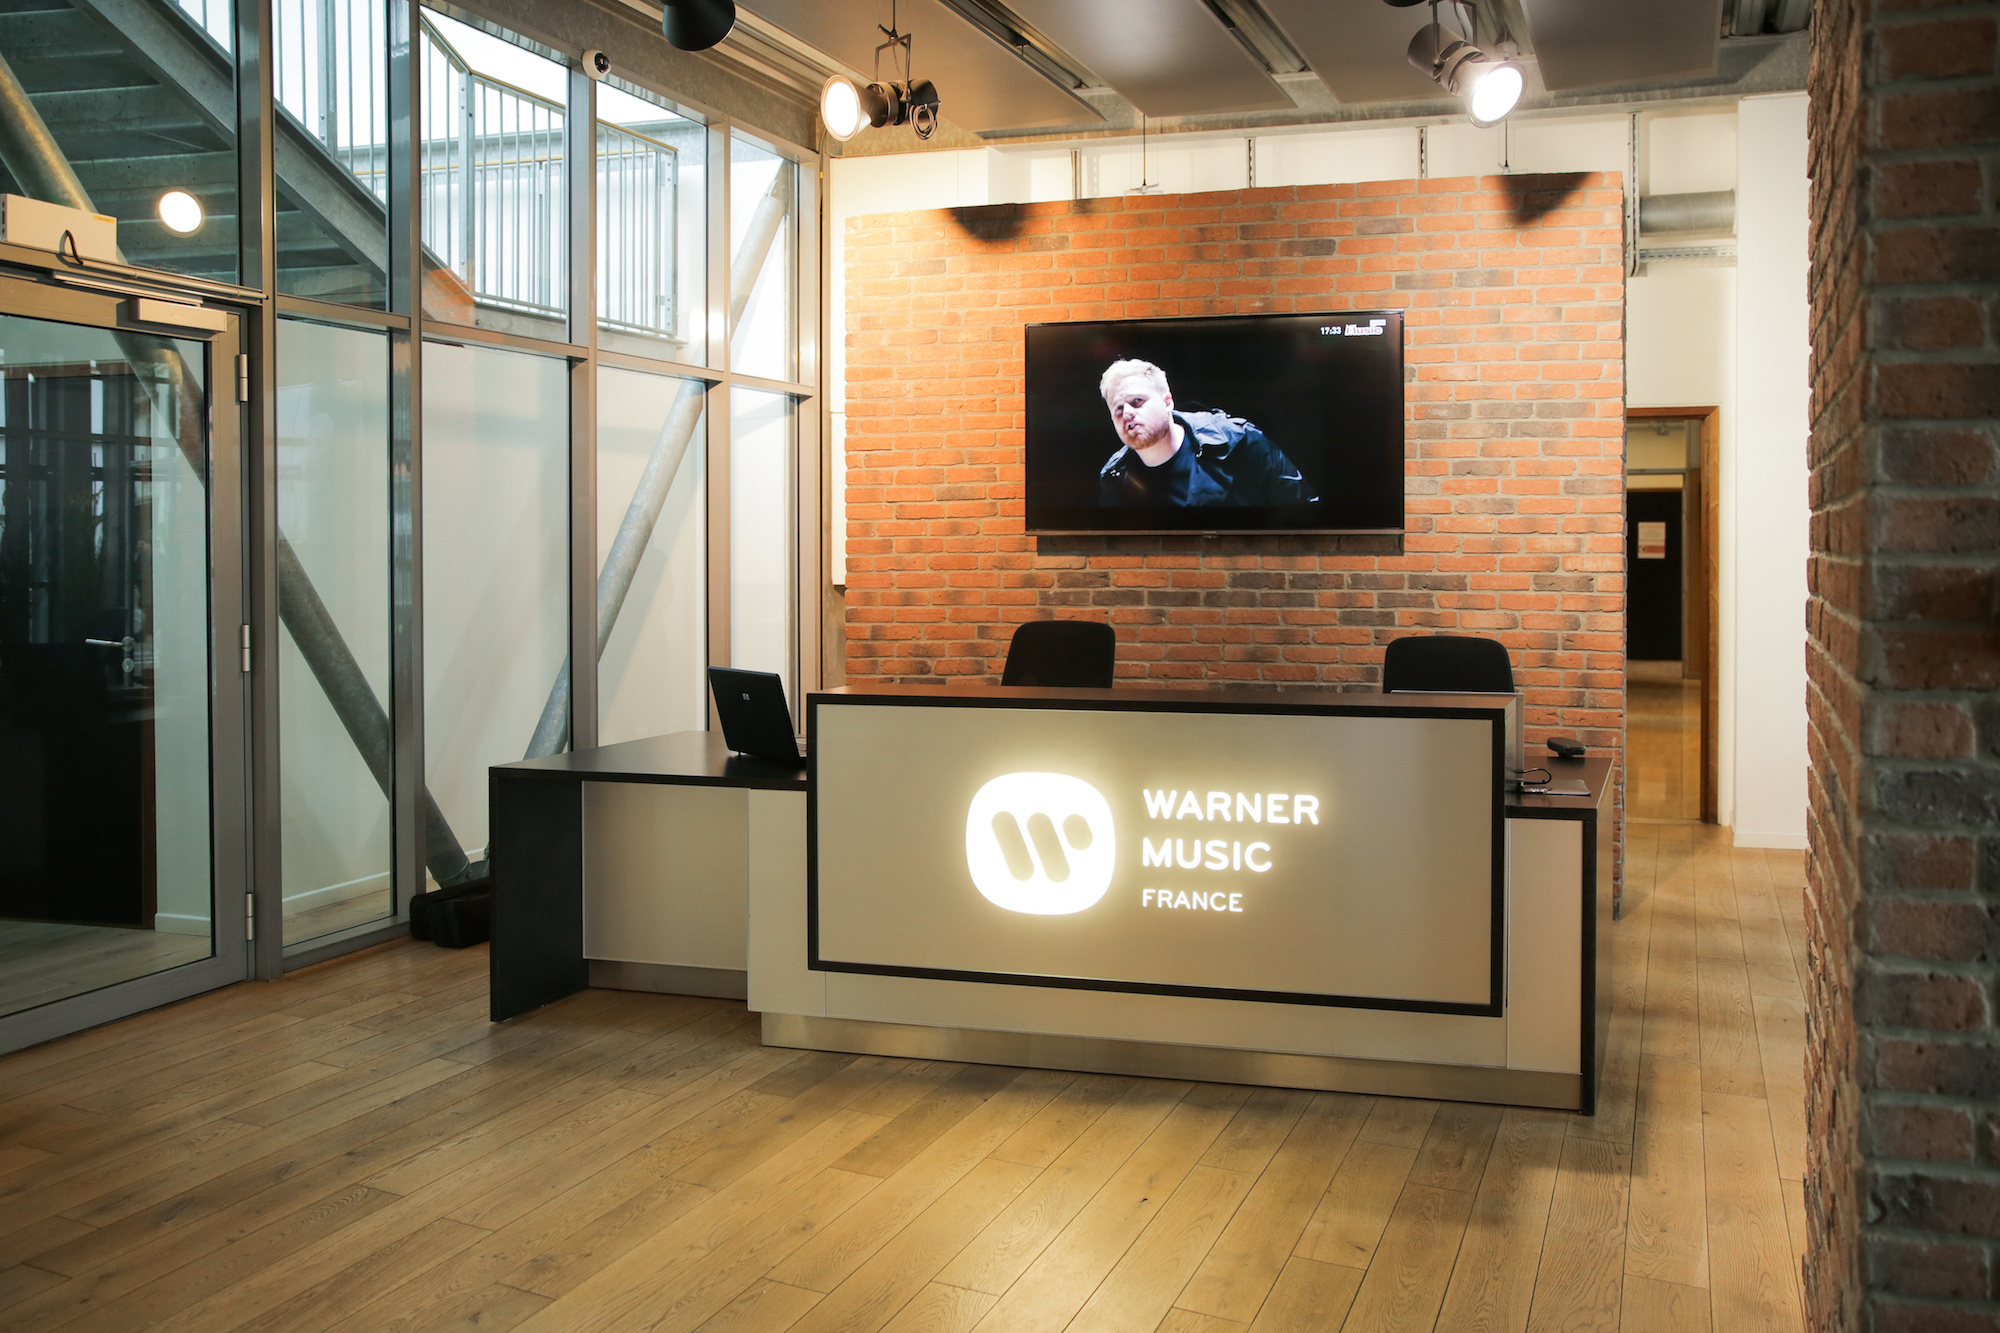 Warner Music France : photos, vidéos, recrutement